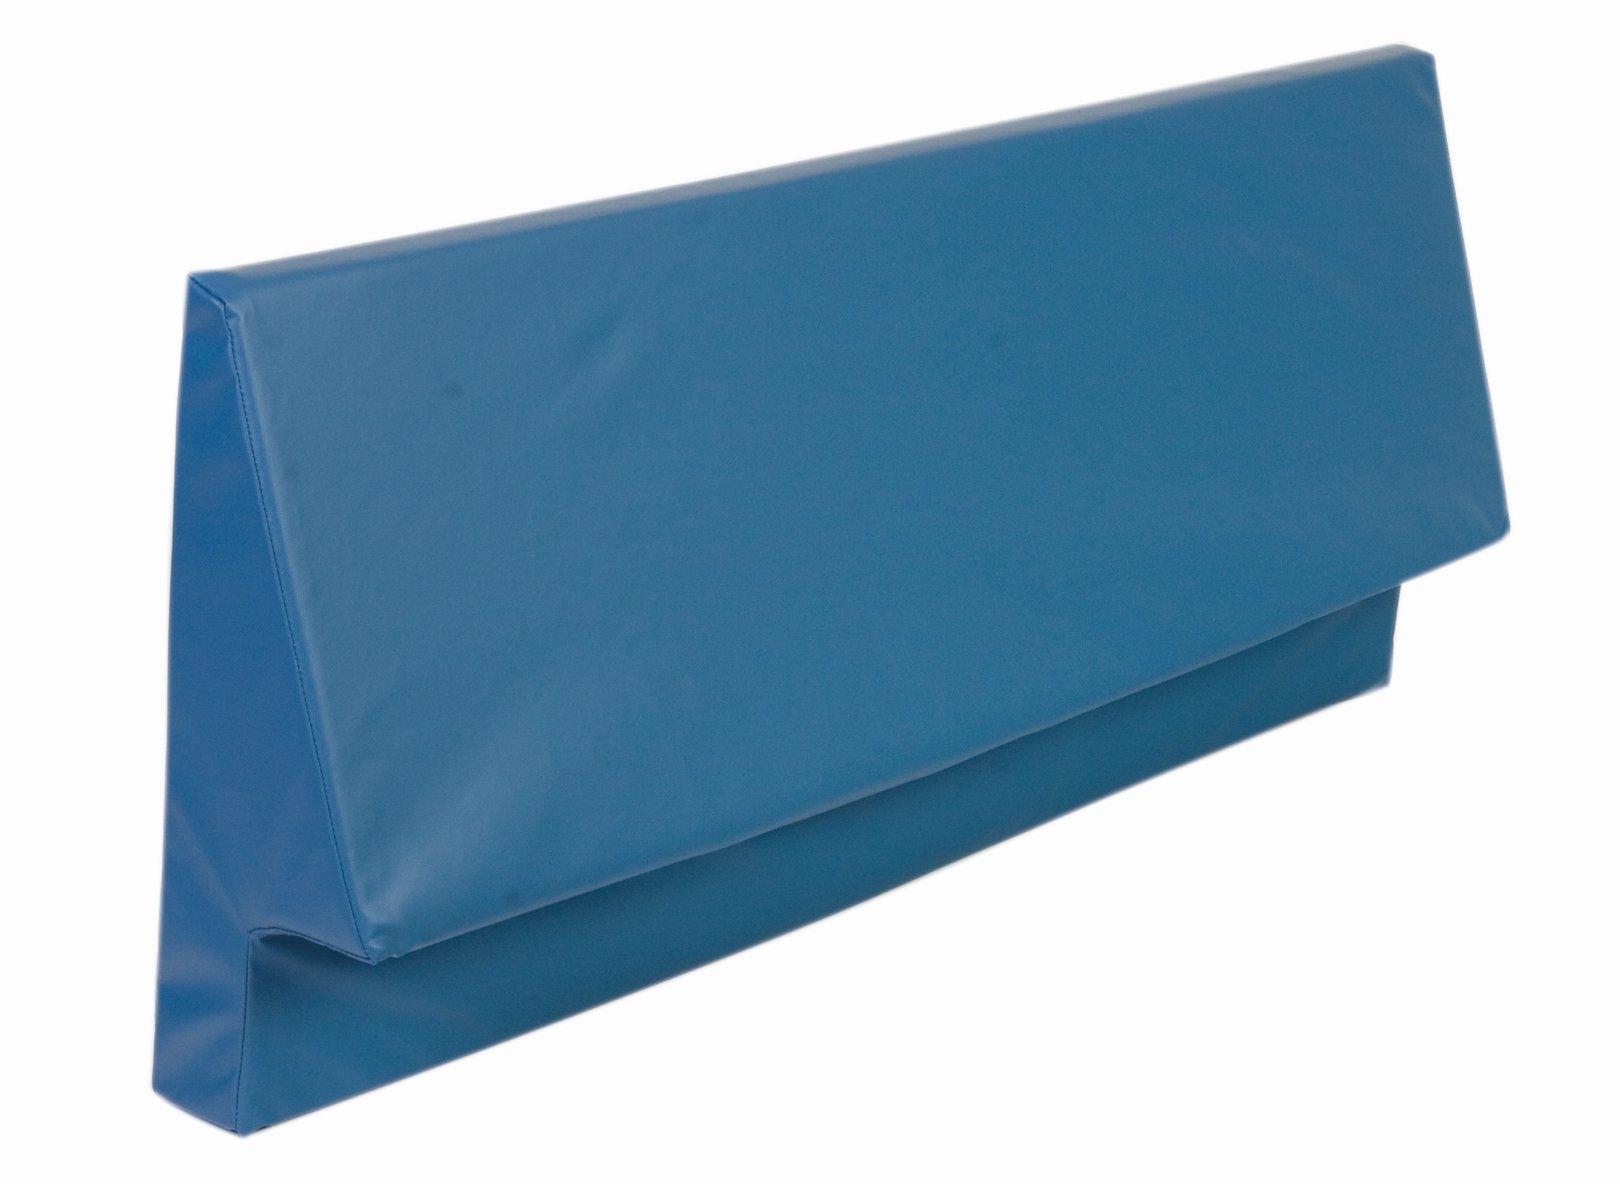 AliMed Bed Rail Bumper Wedges, Upholstered Foam, Bed Bolster, 48''L, Pair